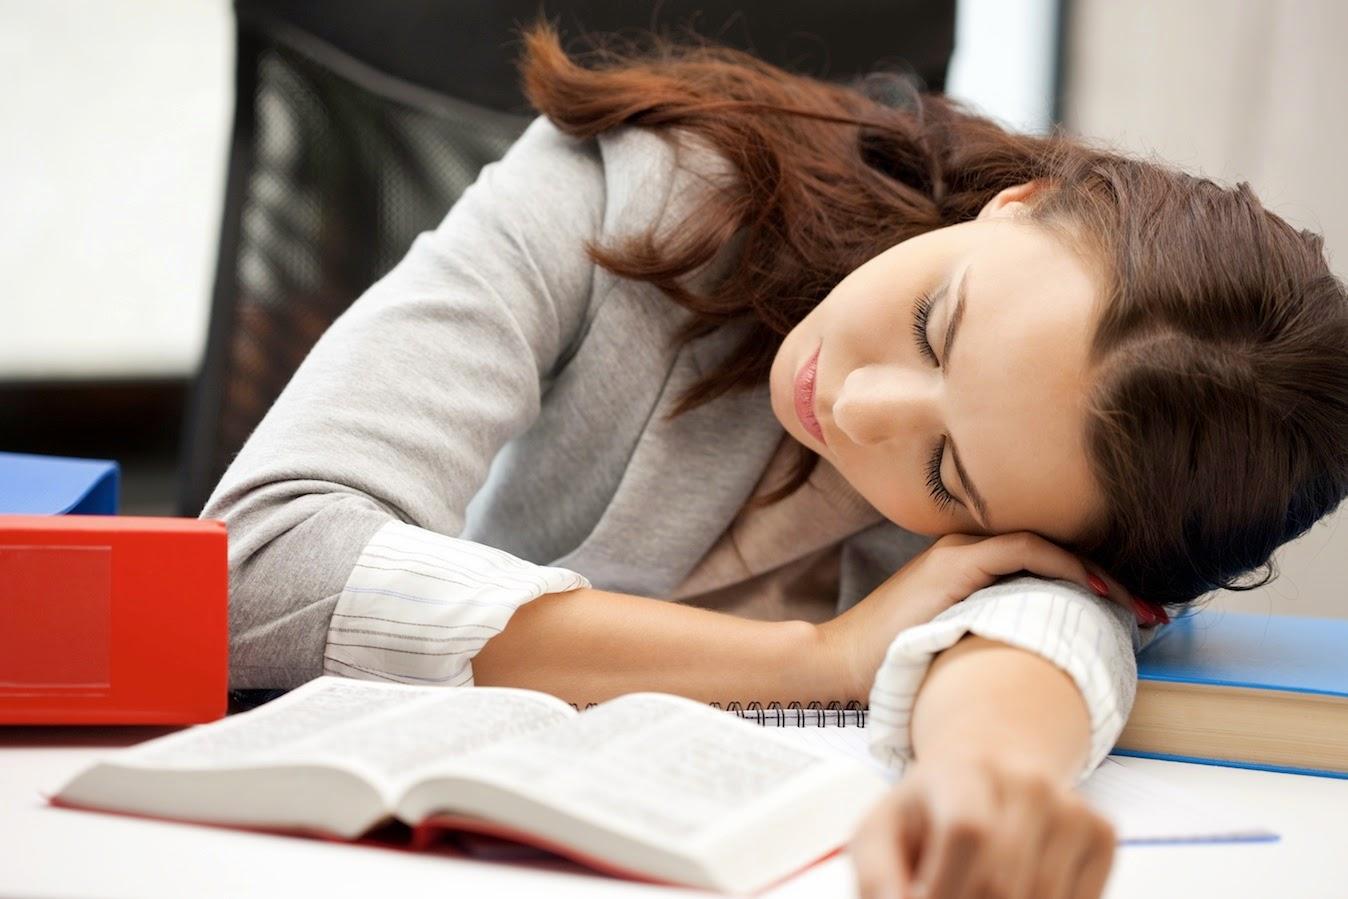 Mengantuk Setelah Makan Siang? Atasi dengan Cara Ini!